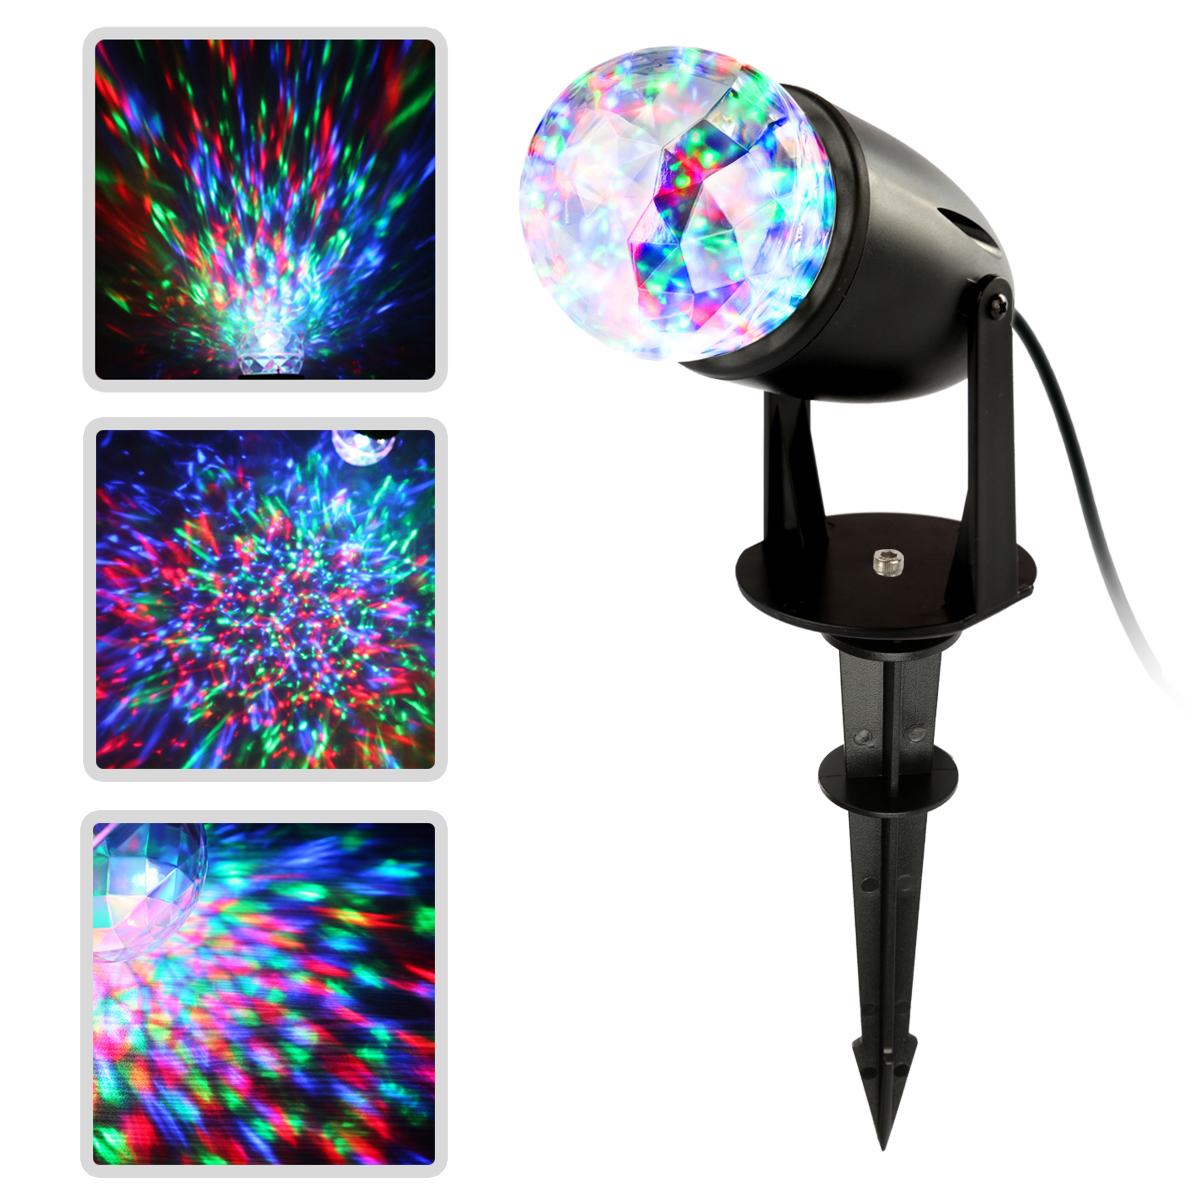 1 Pc Waterproof Magical Spotlight Rotating Led Projector